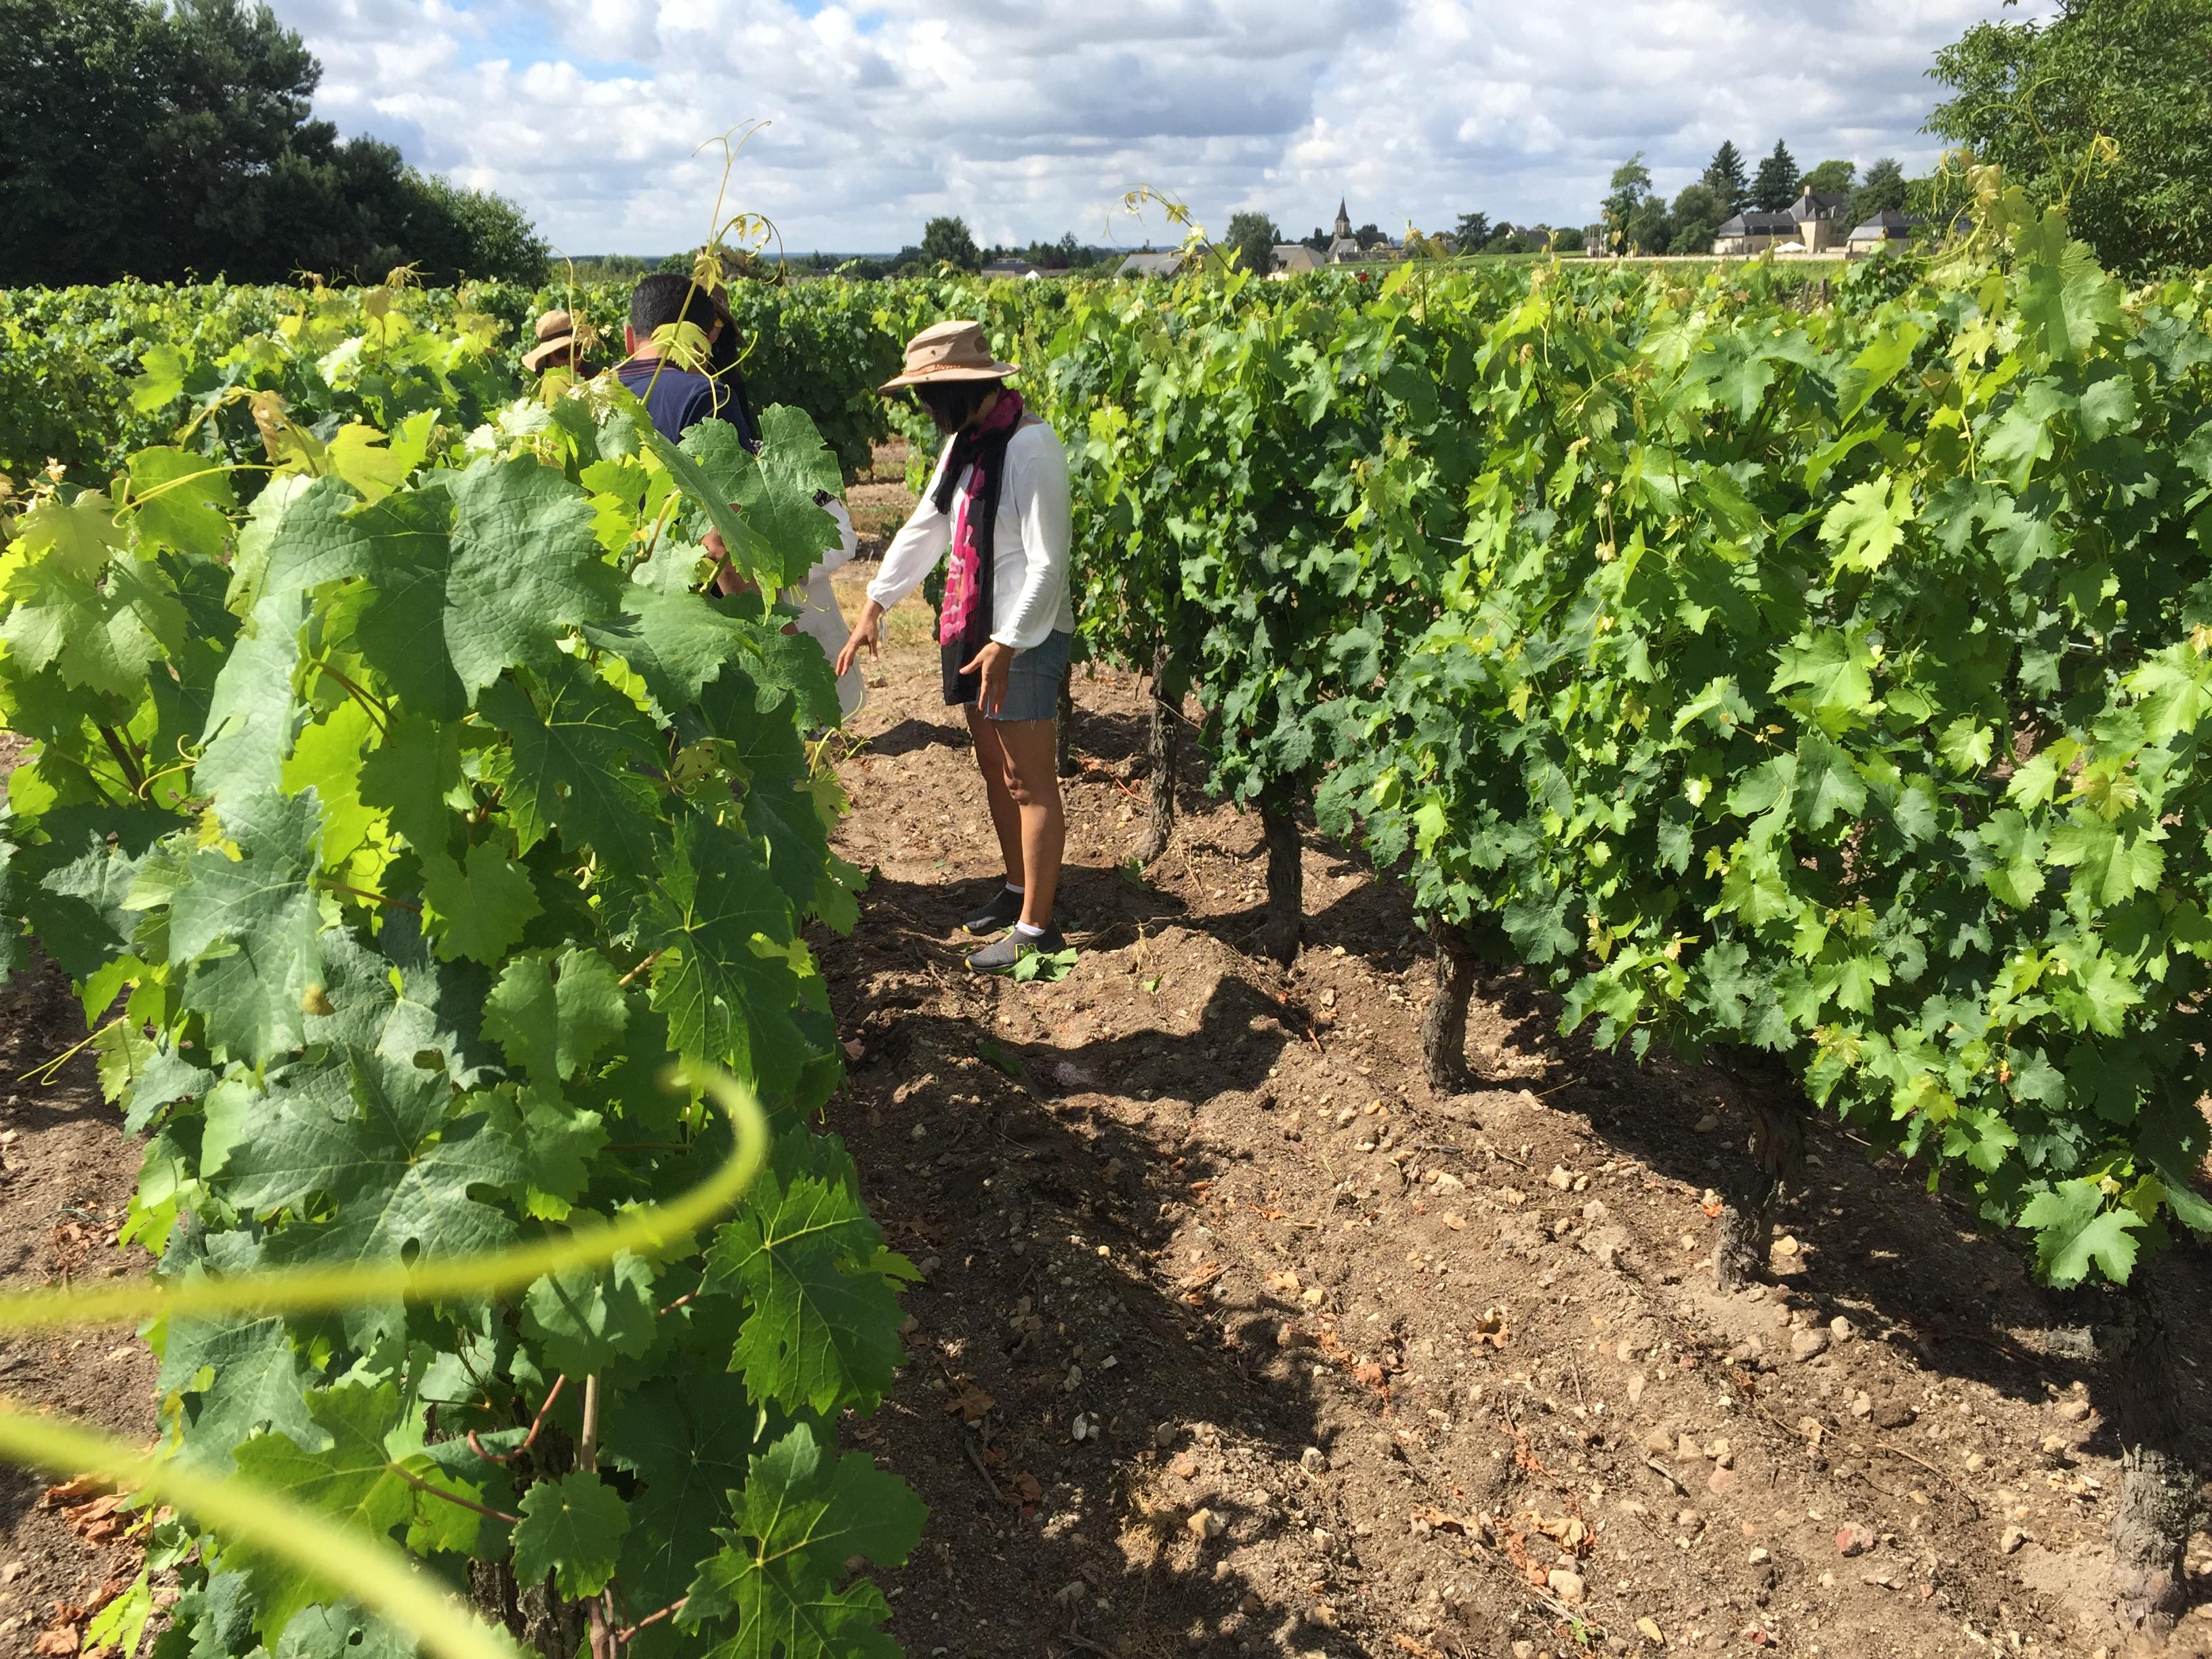 Passing Vineyards